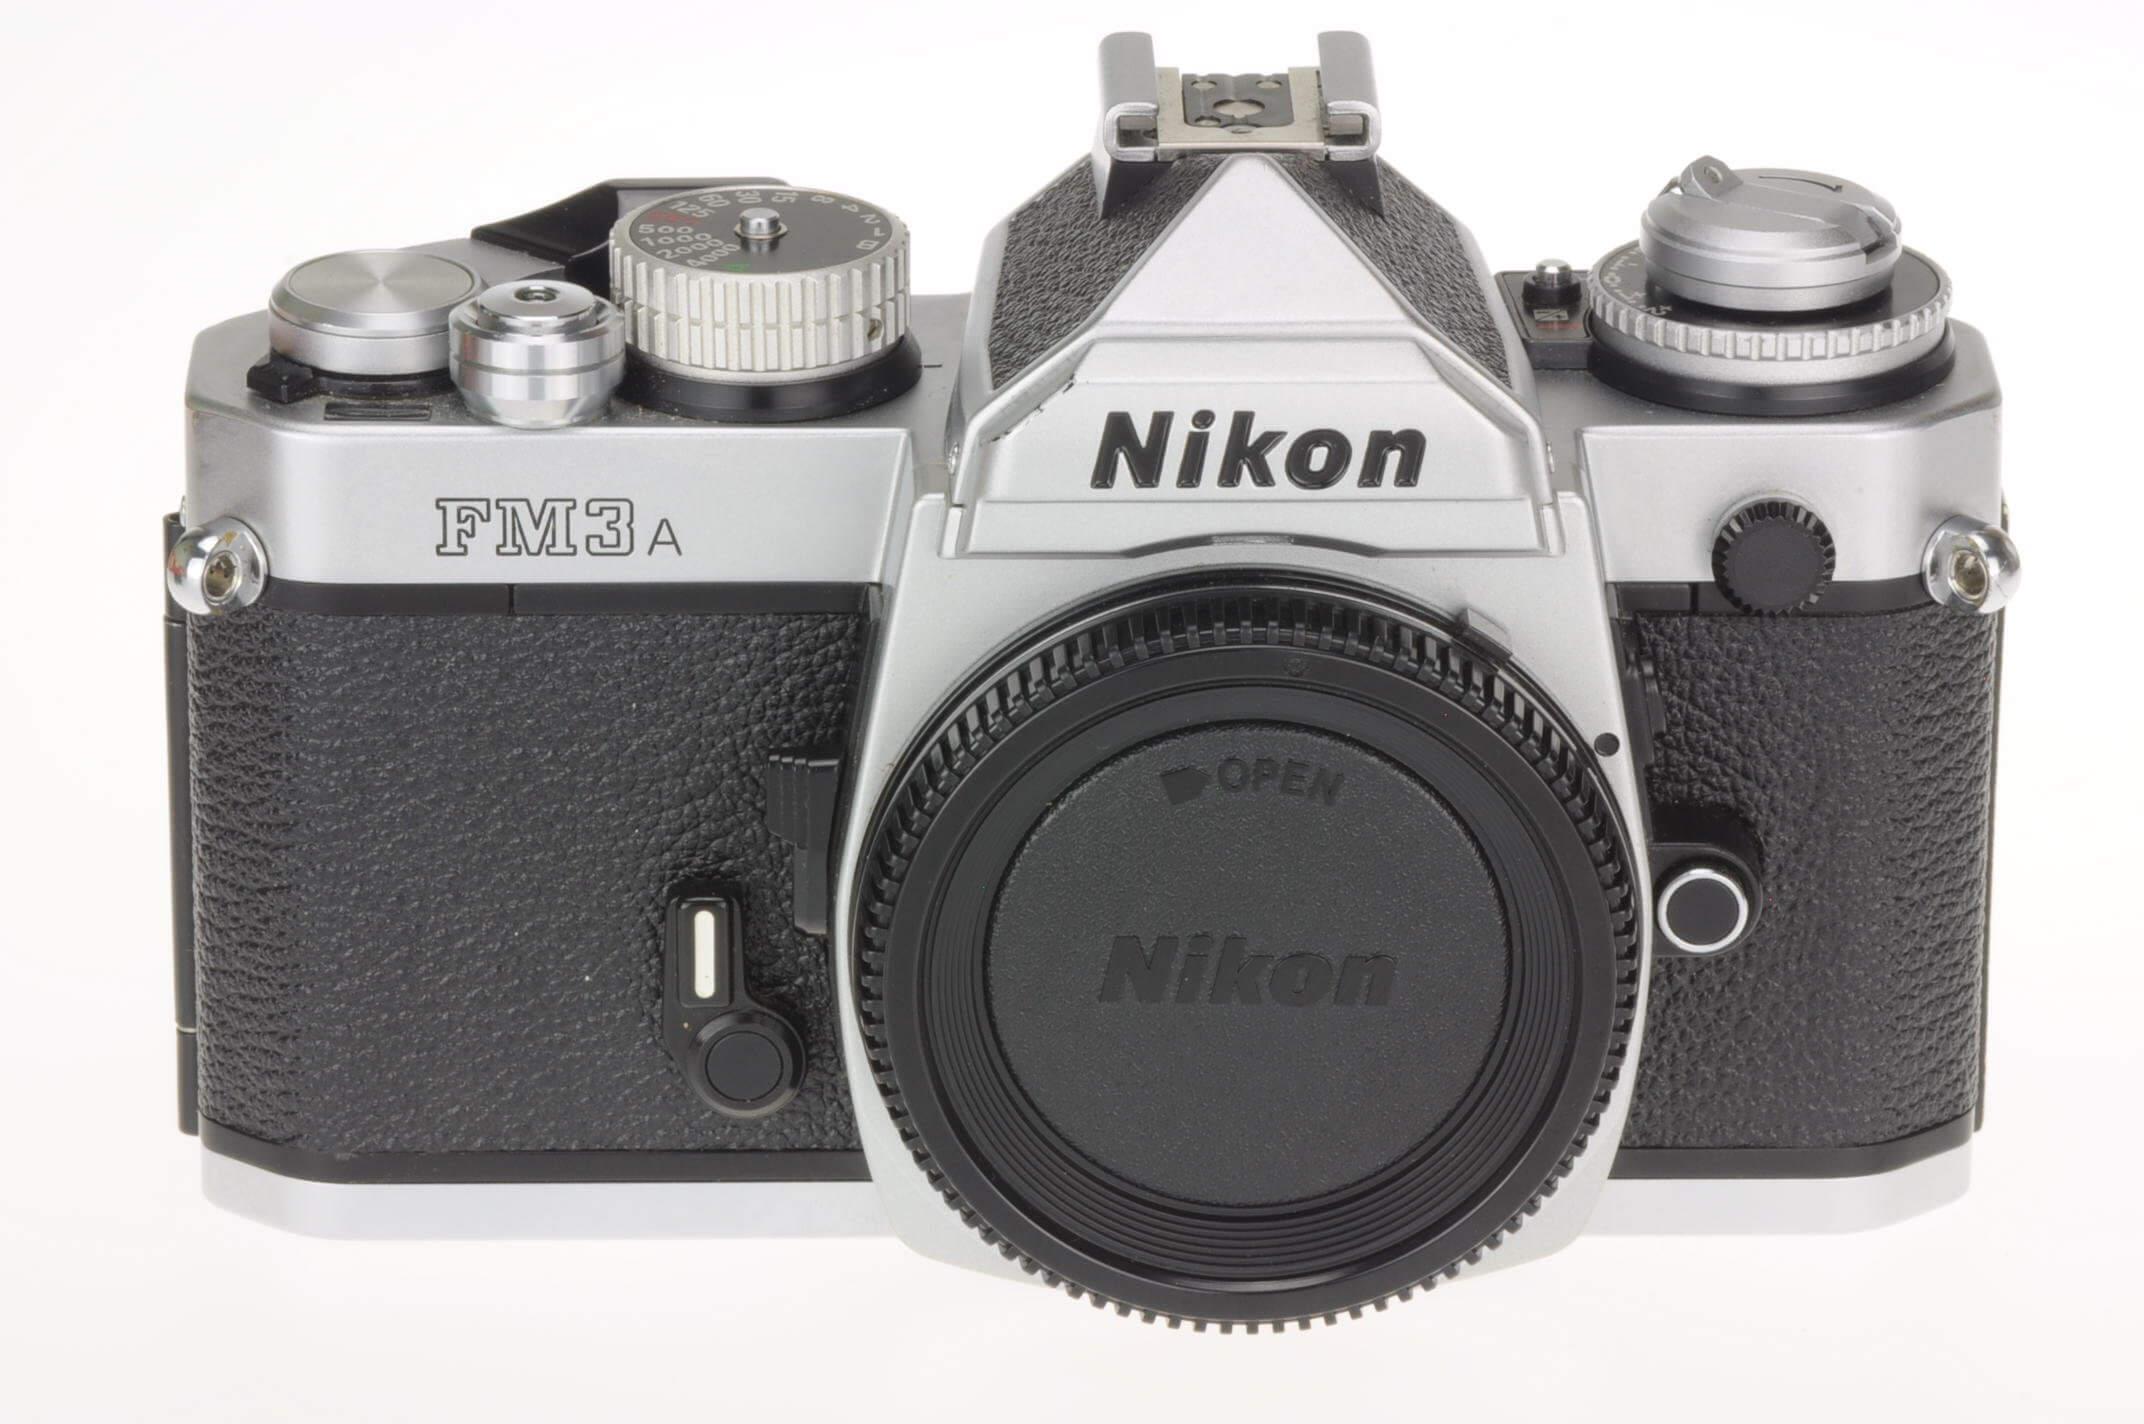 Nikon FM3a body, an excellent user!